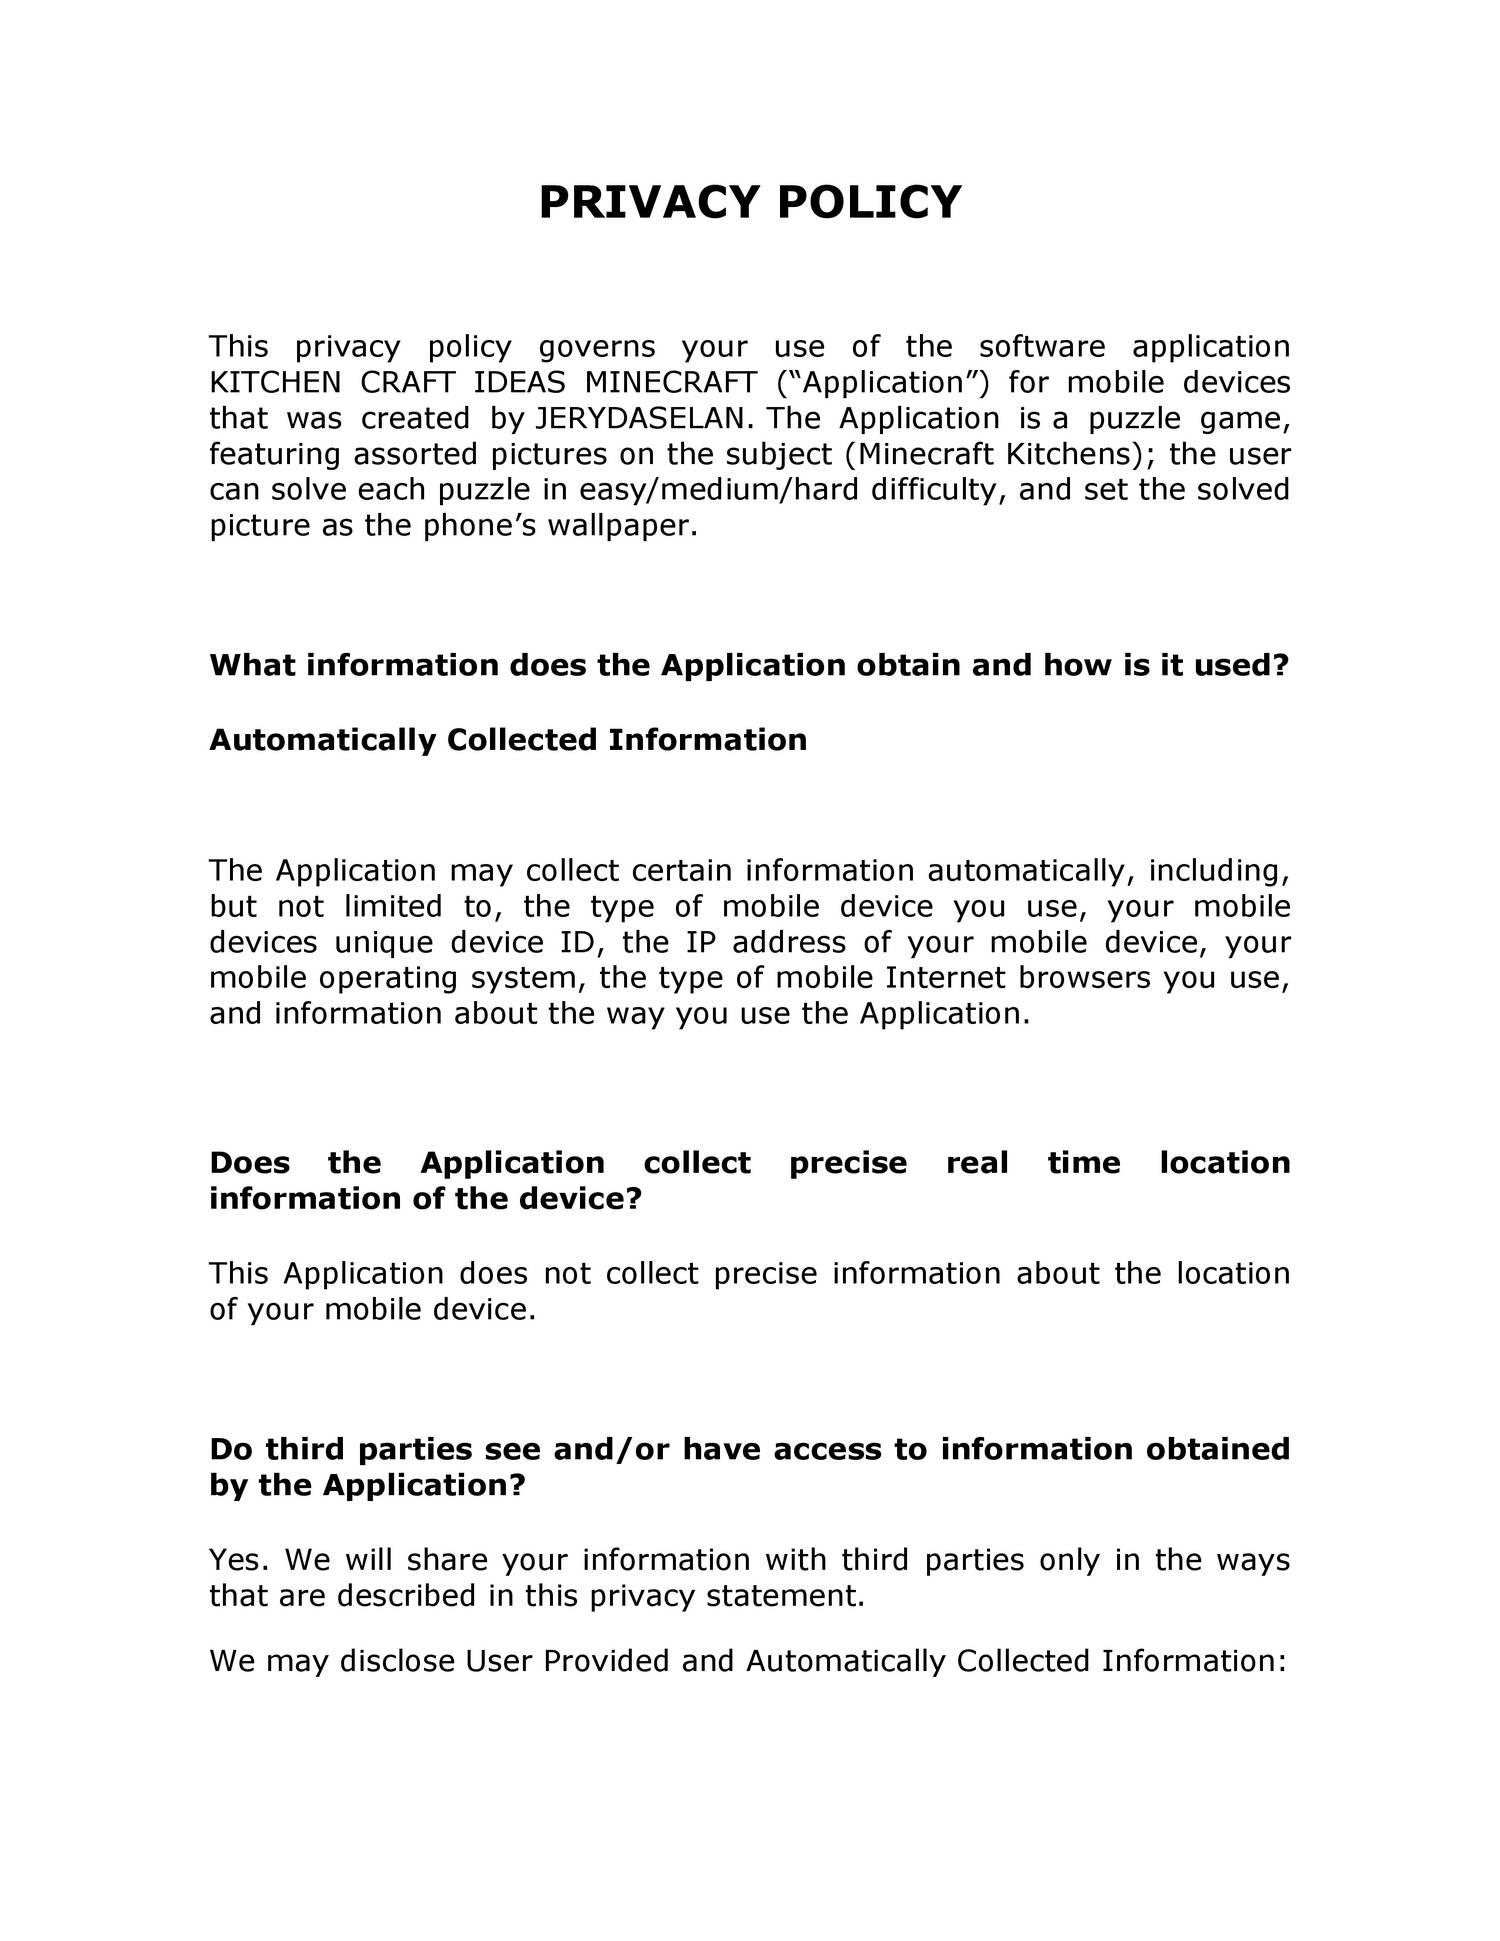 Kitchen Craft Ideas Minecraft Privacy Policy Pdf Docdroid